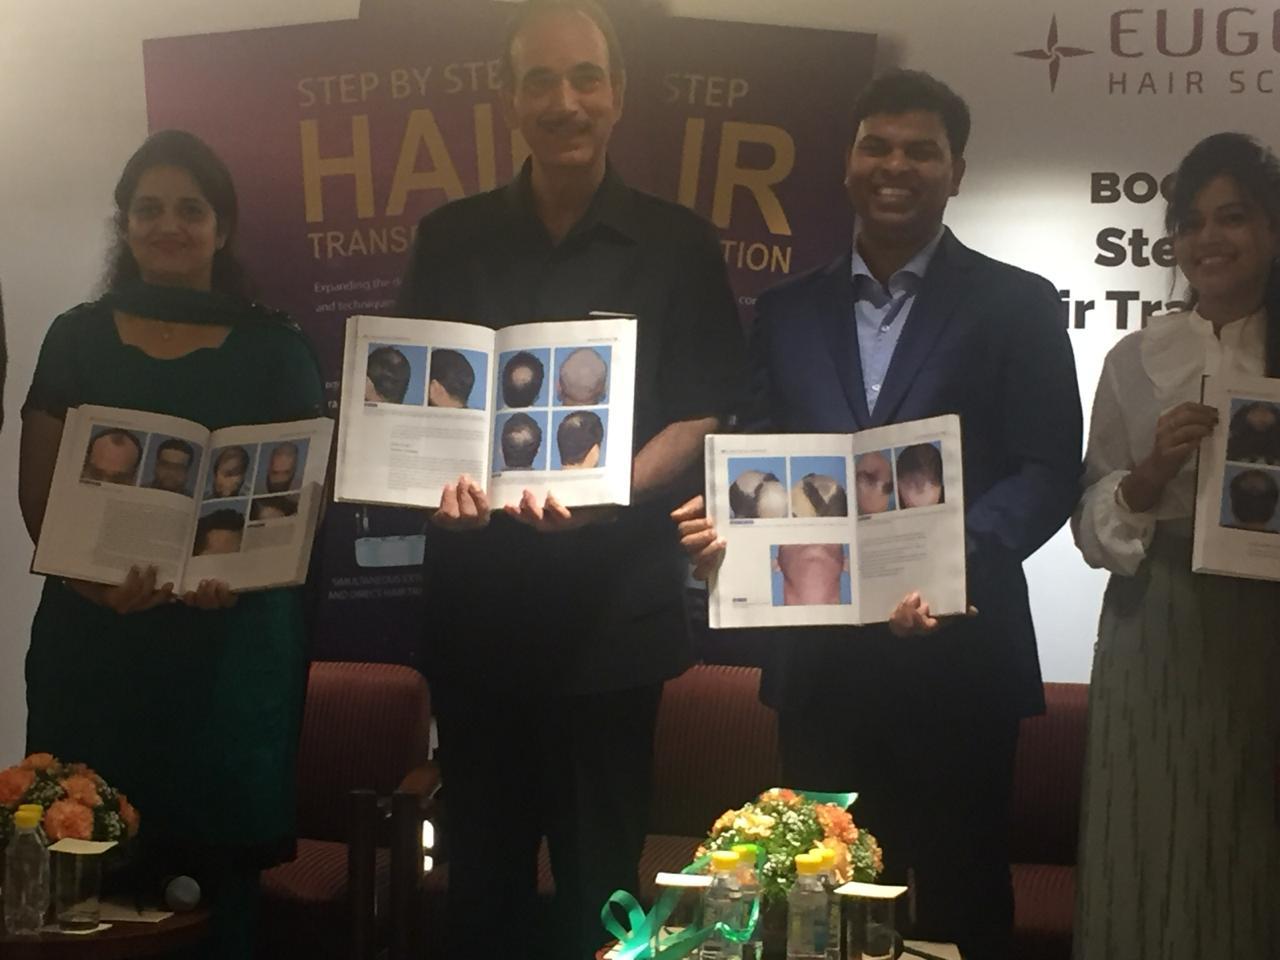 Women Find Bald Men Unattractive: Former Health Minister Ghulam Nabi Azad